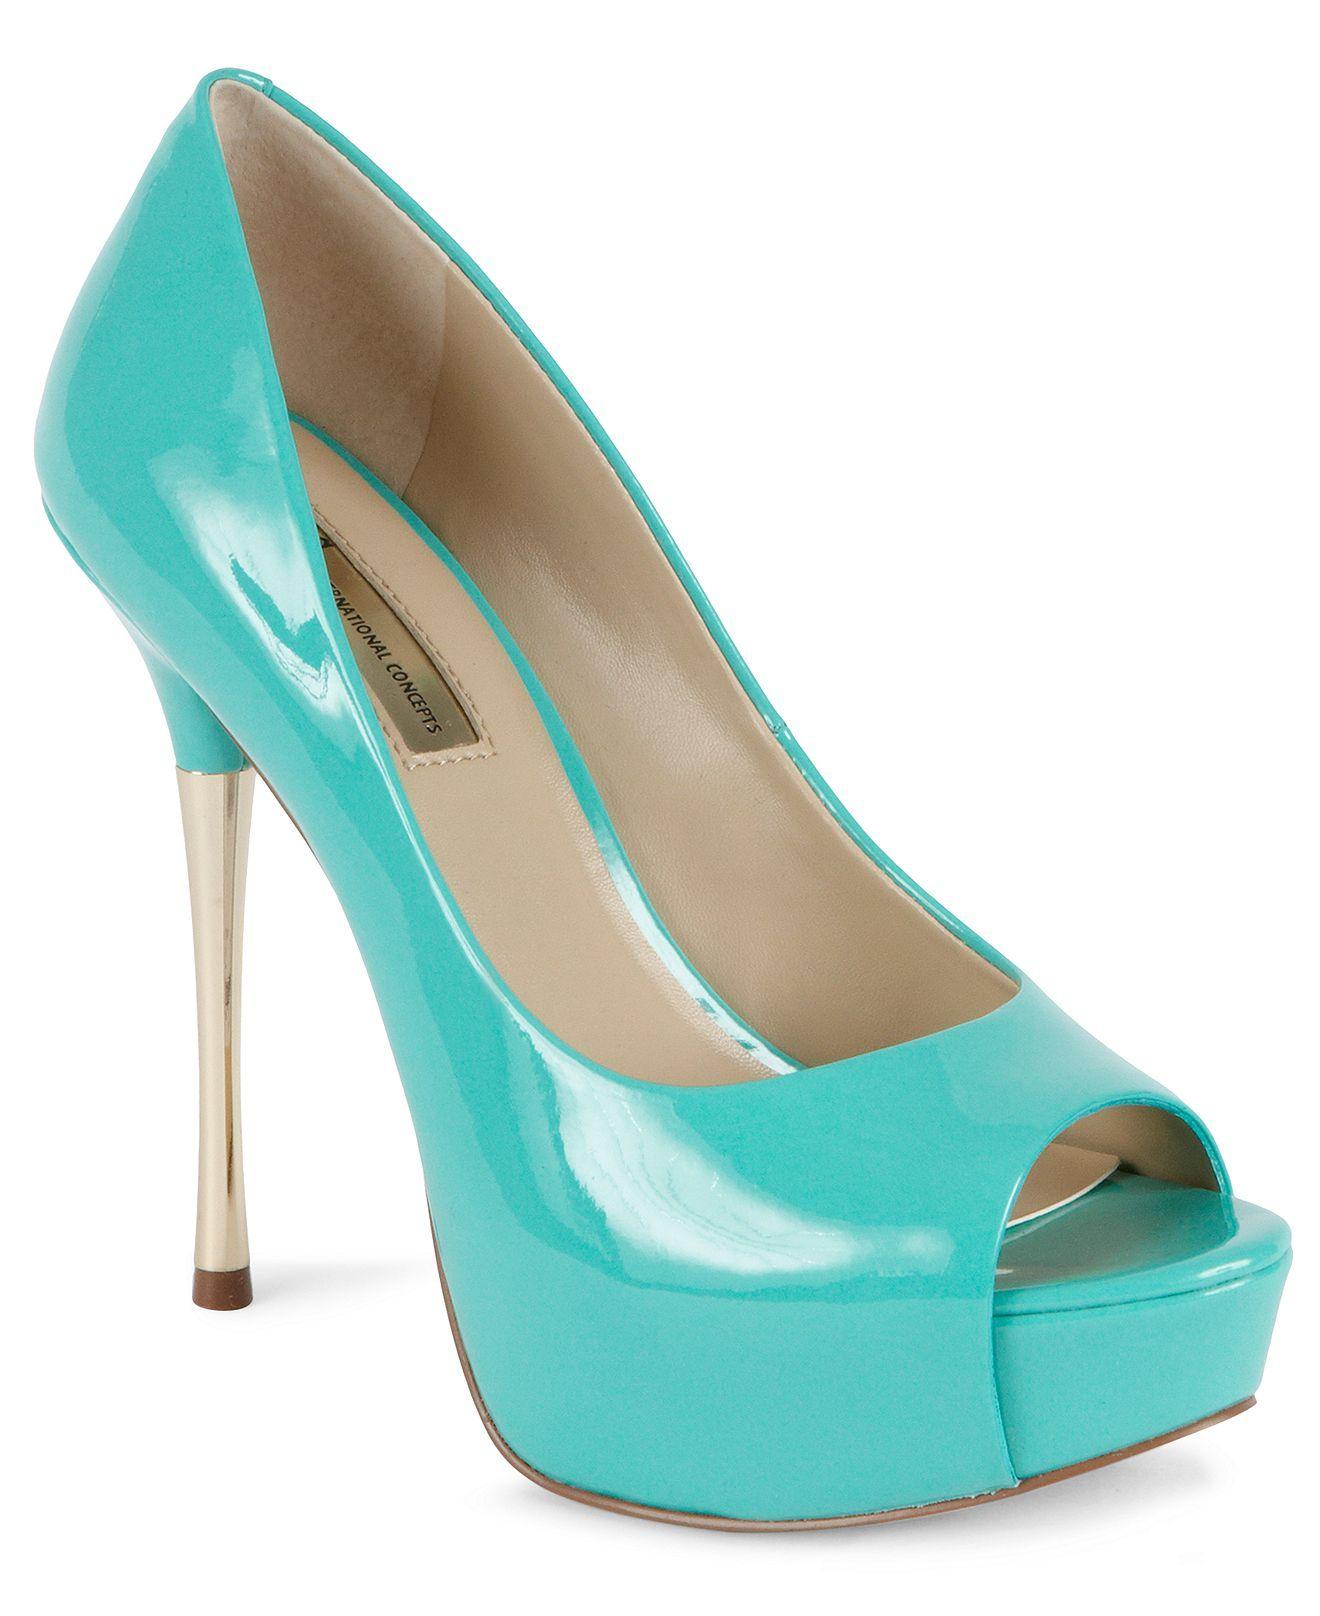 f8035e0f80d INC International Concepts Womens Shoes